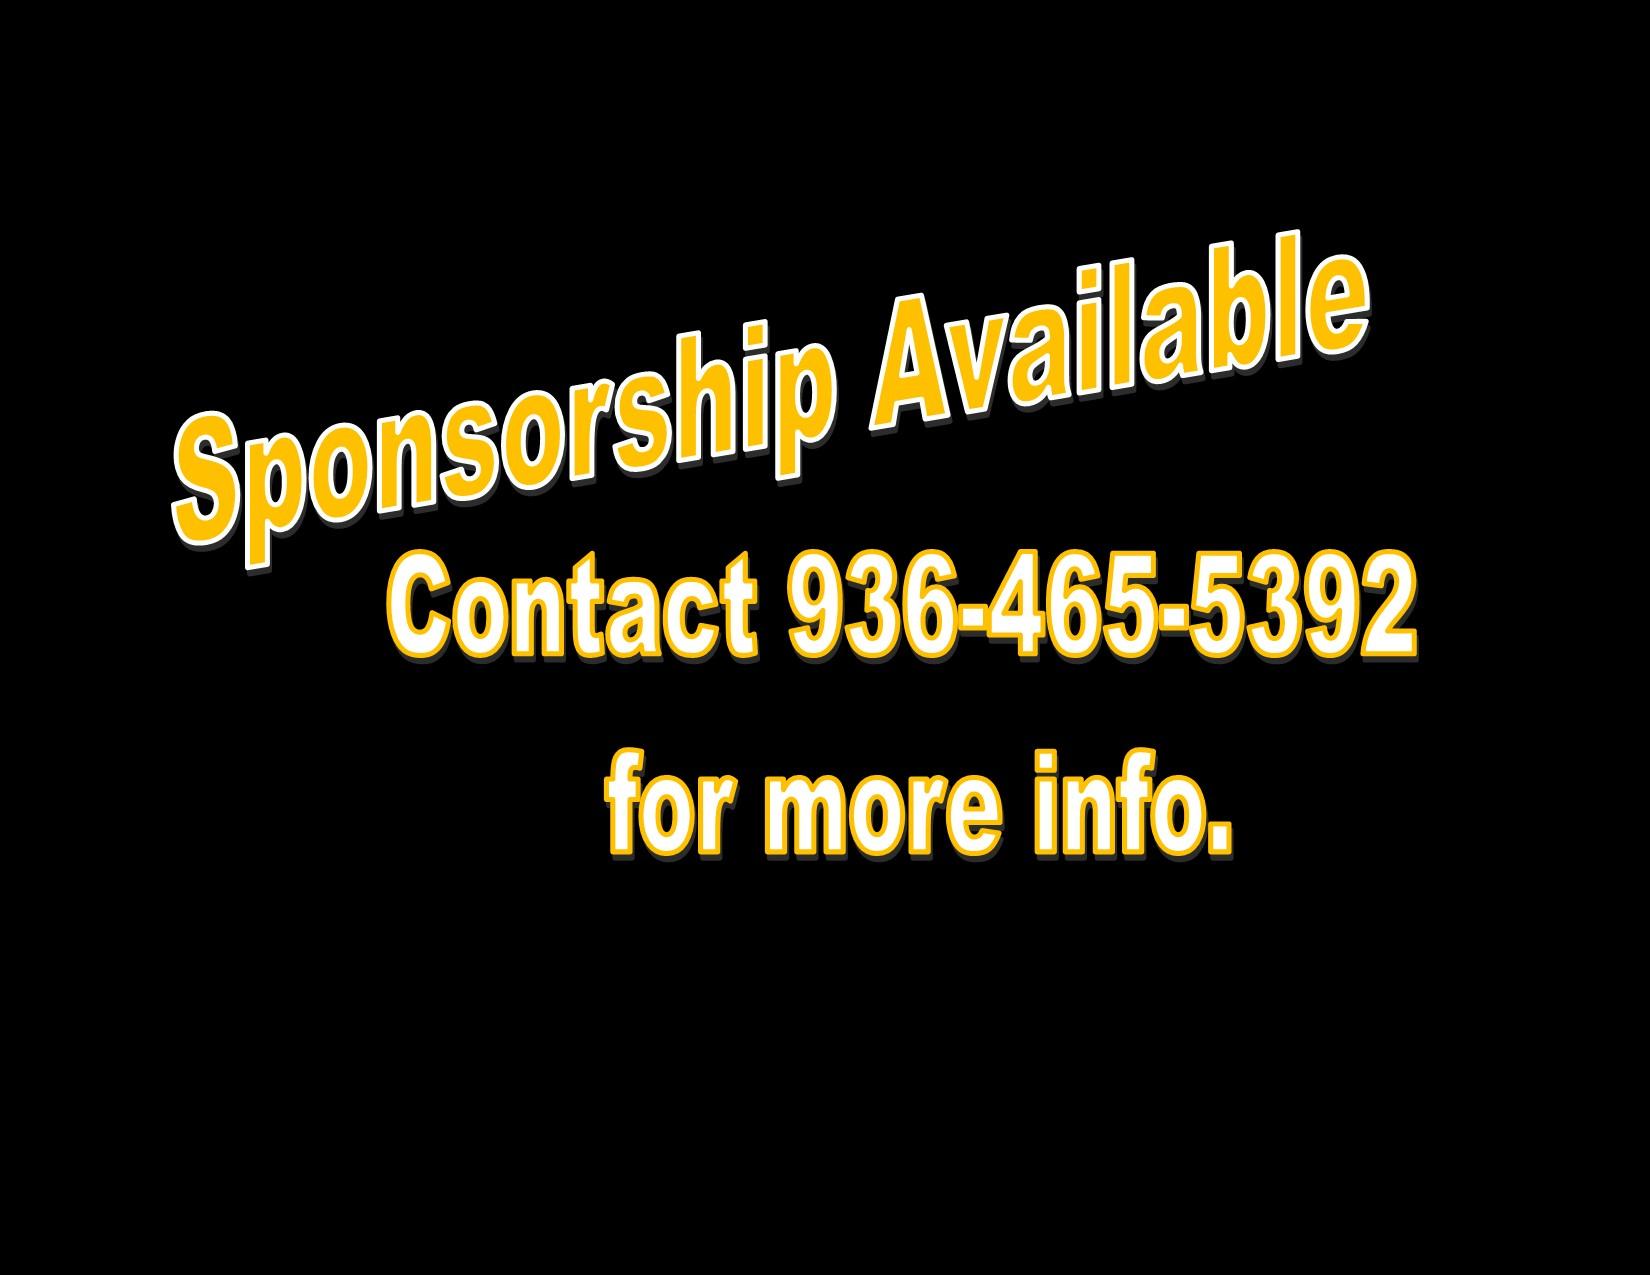 Sponsorship available